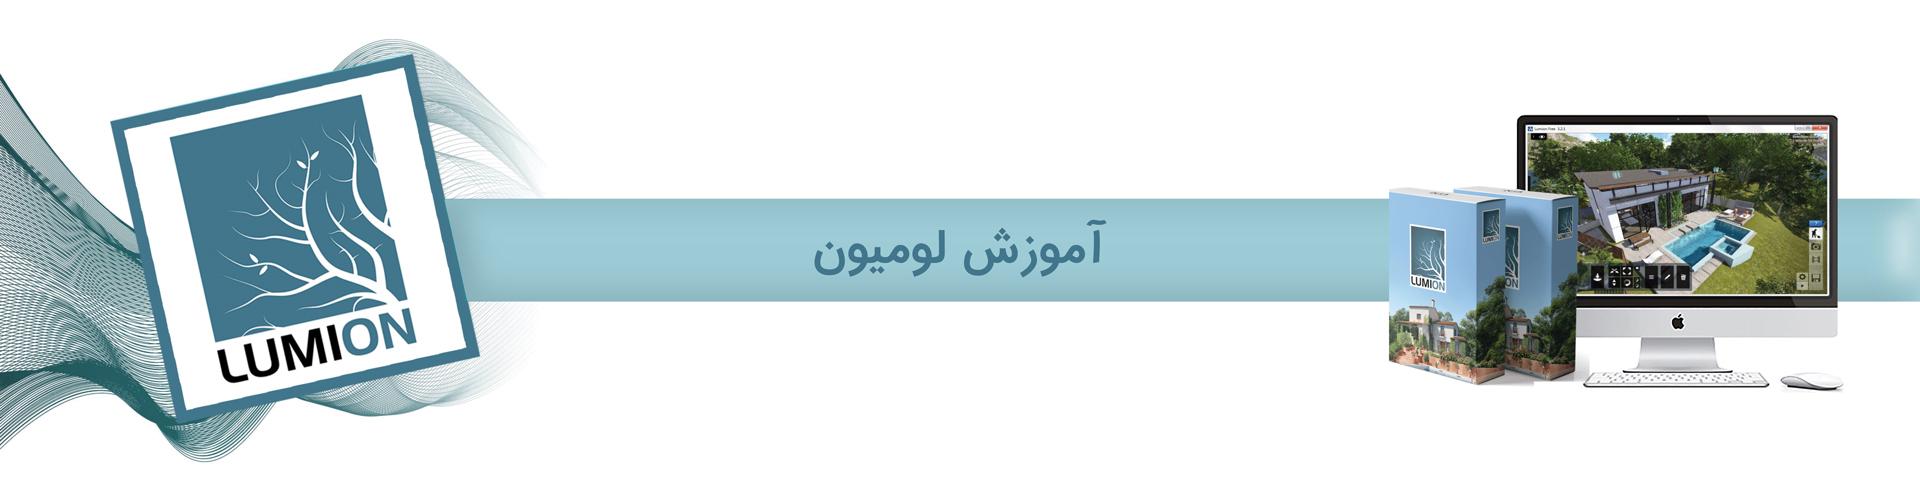 header lumion - آموزش لومیون | lumion